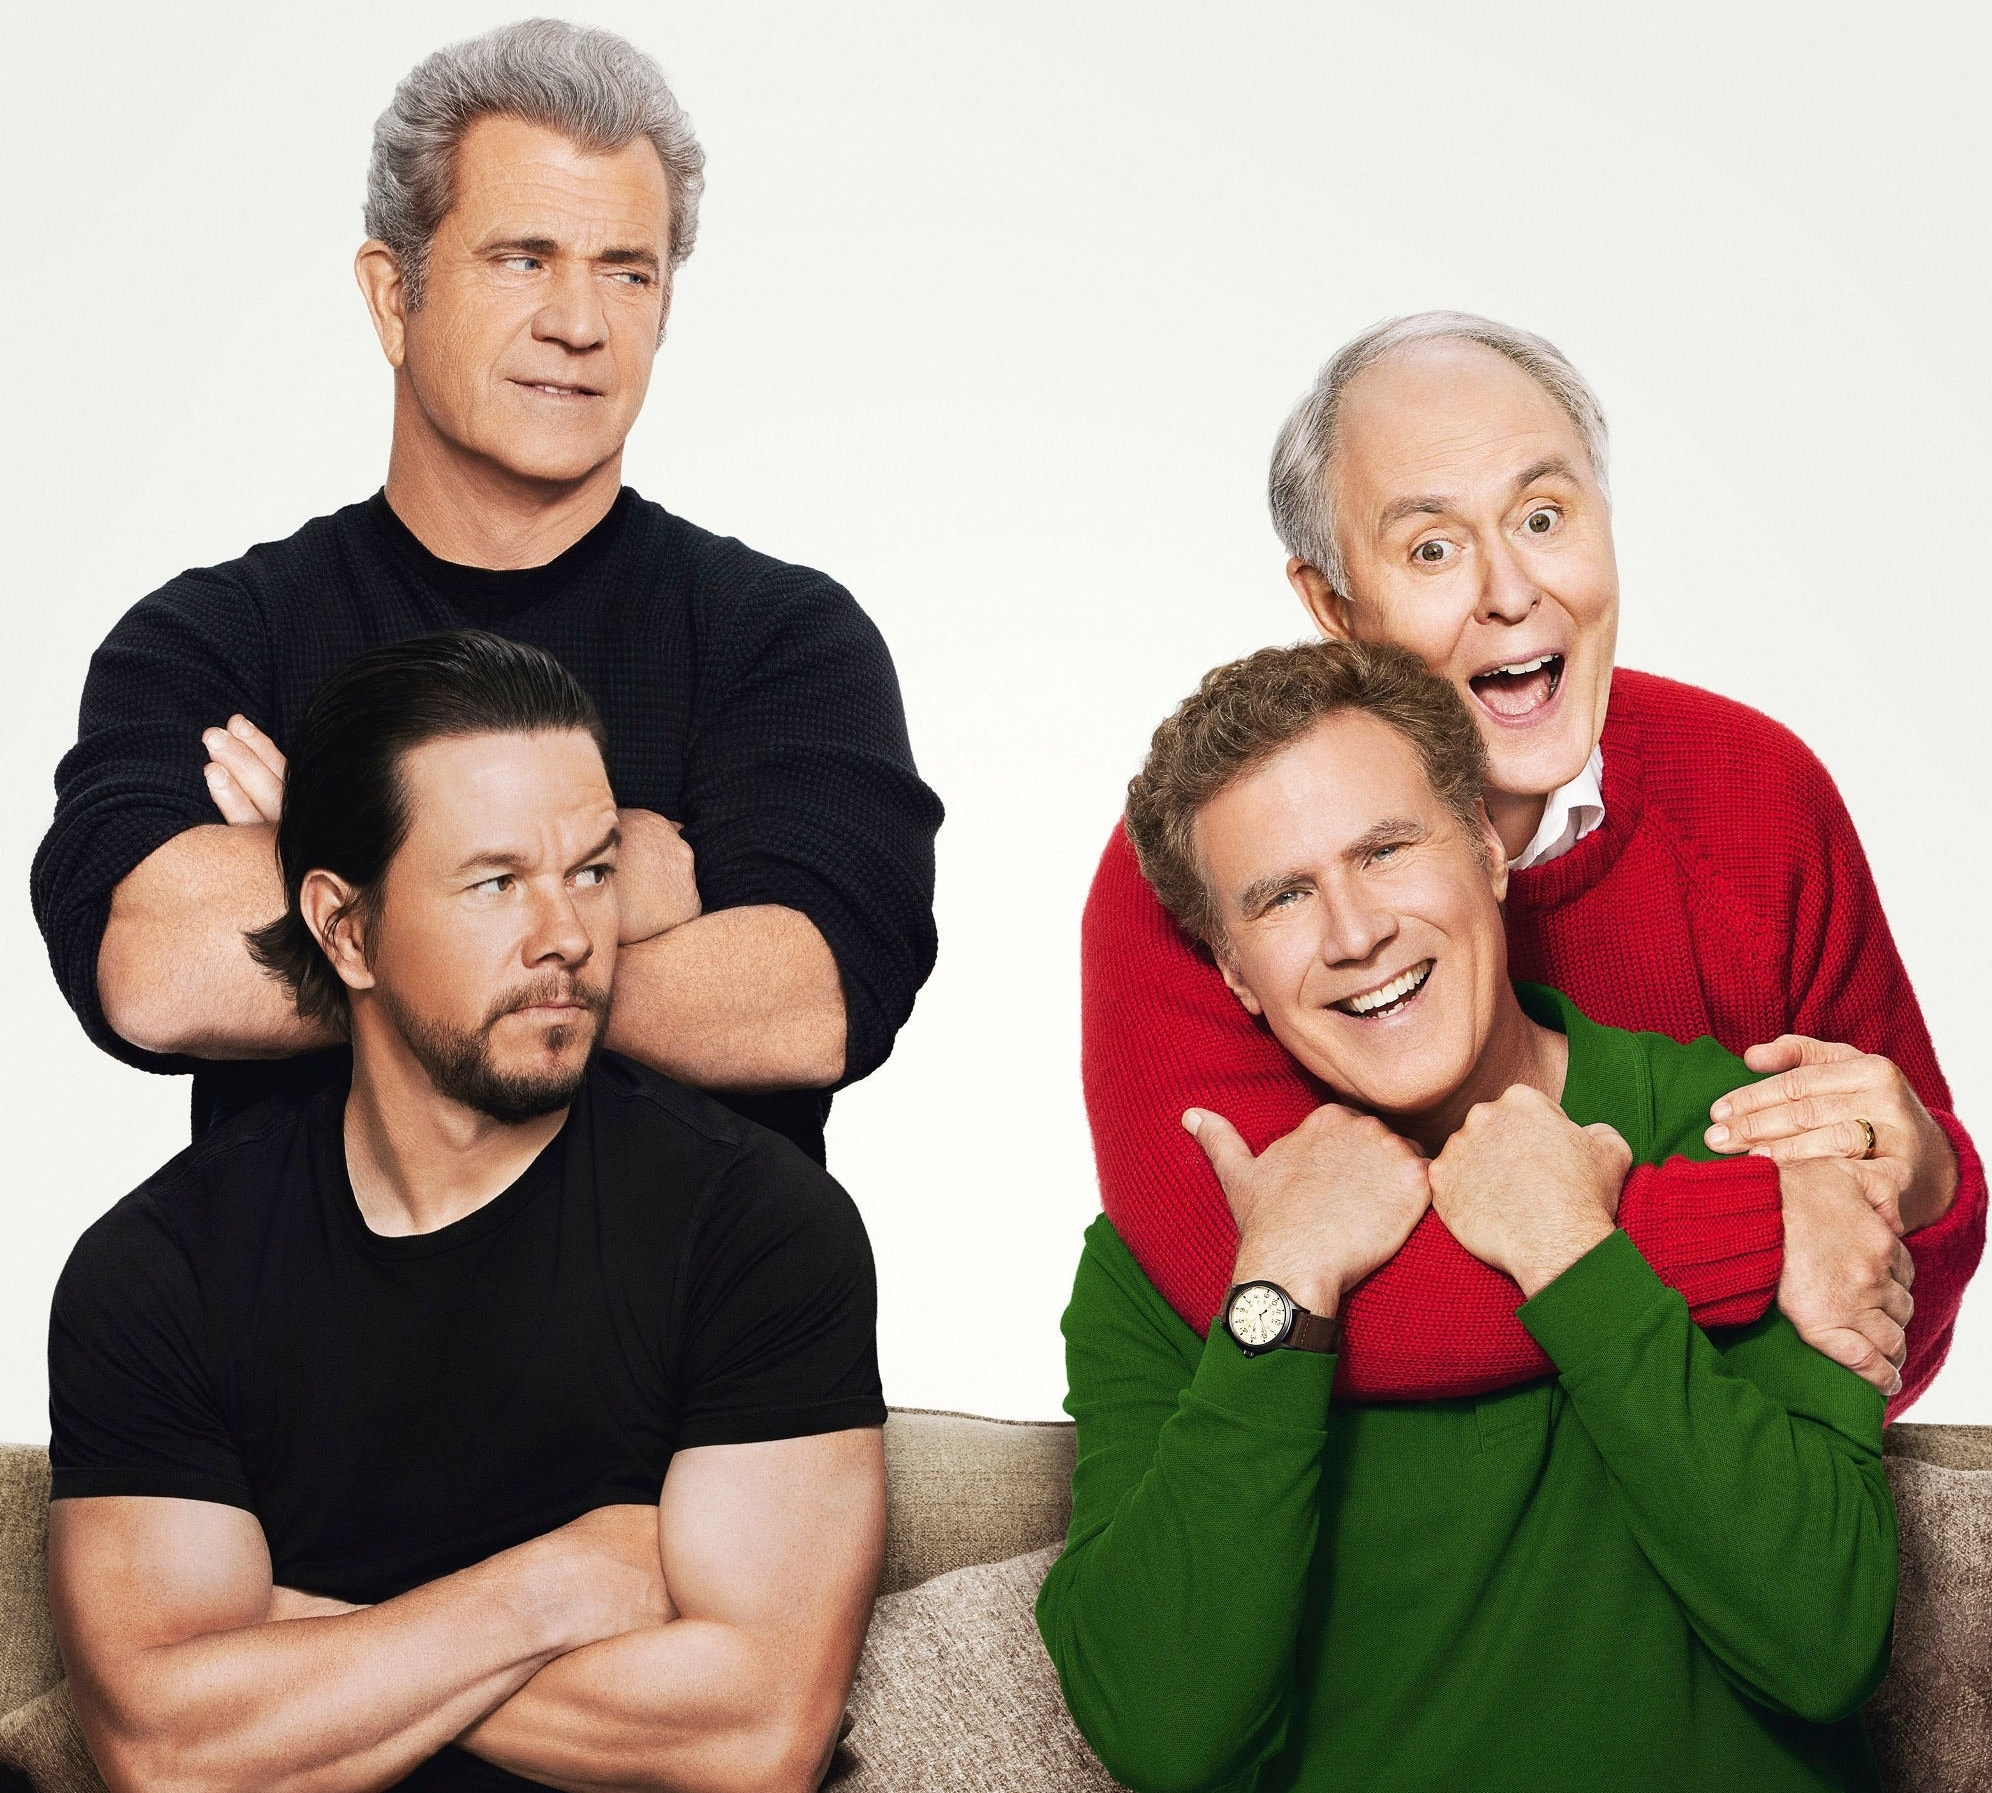 Christmas clichés: - Hate Becomes LoveCute, Precocious ChildSage Grandpa FigureTree Buy & Trim